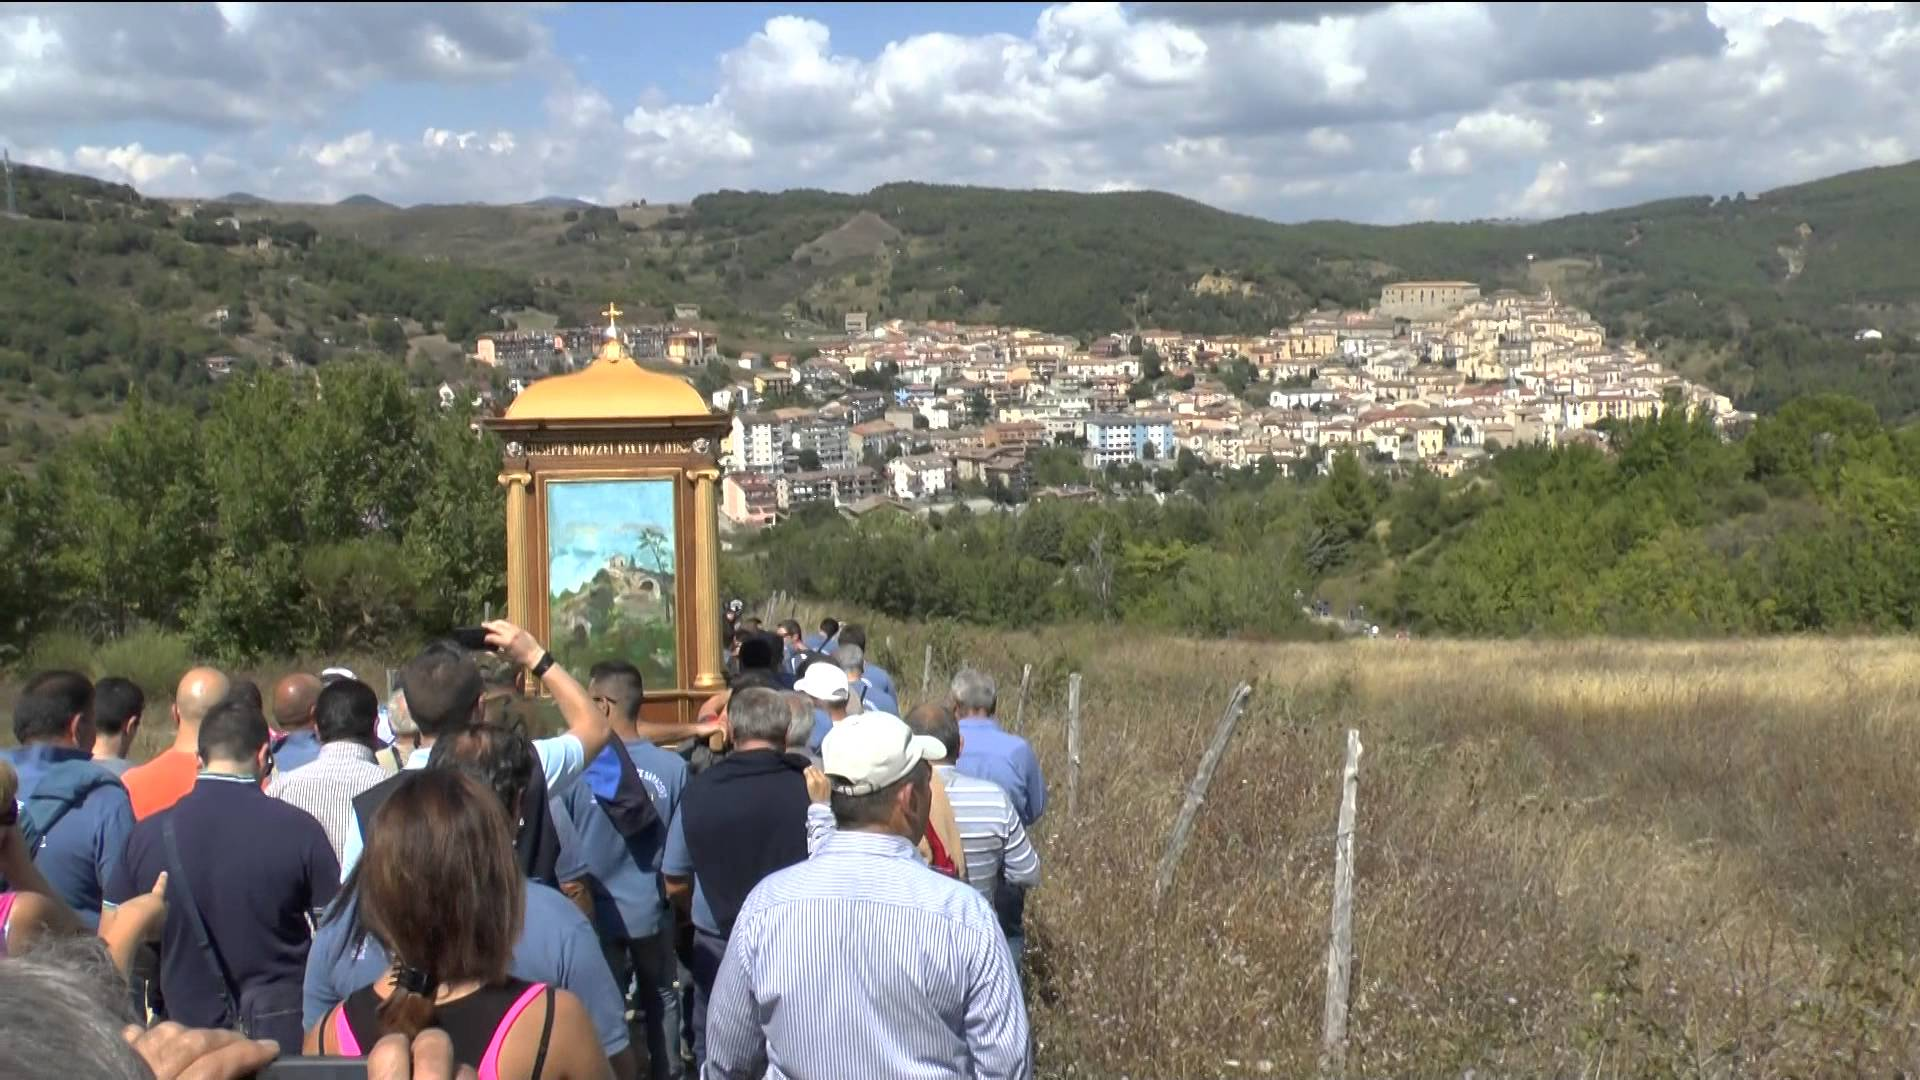 Madonna Monte Saraceno, Calvello - Potenza